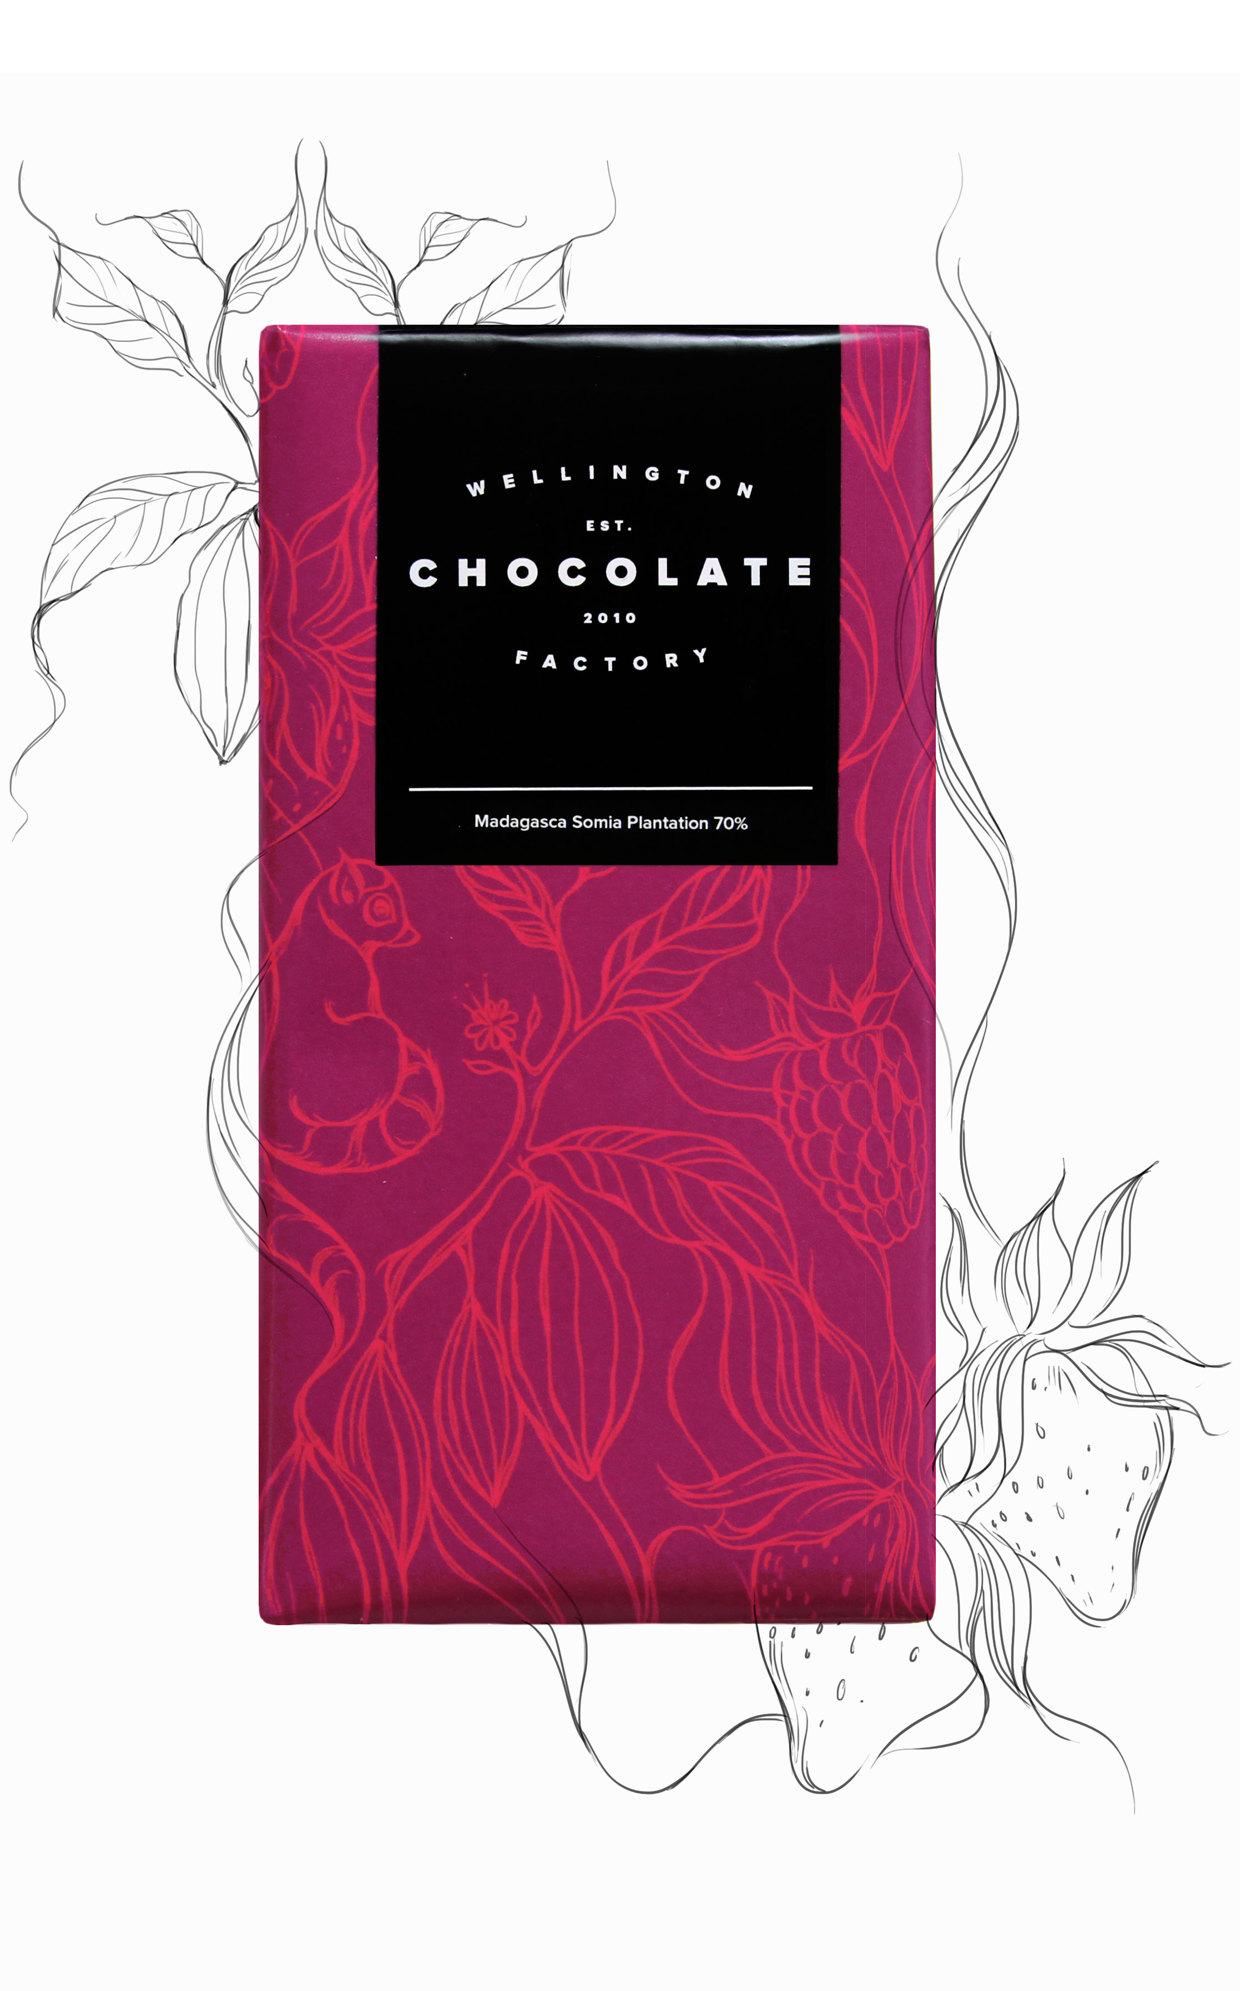 cikolata-ambalaji-3